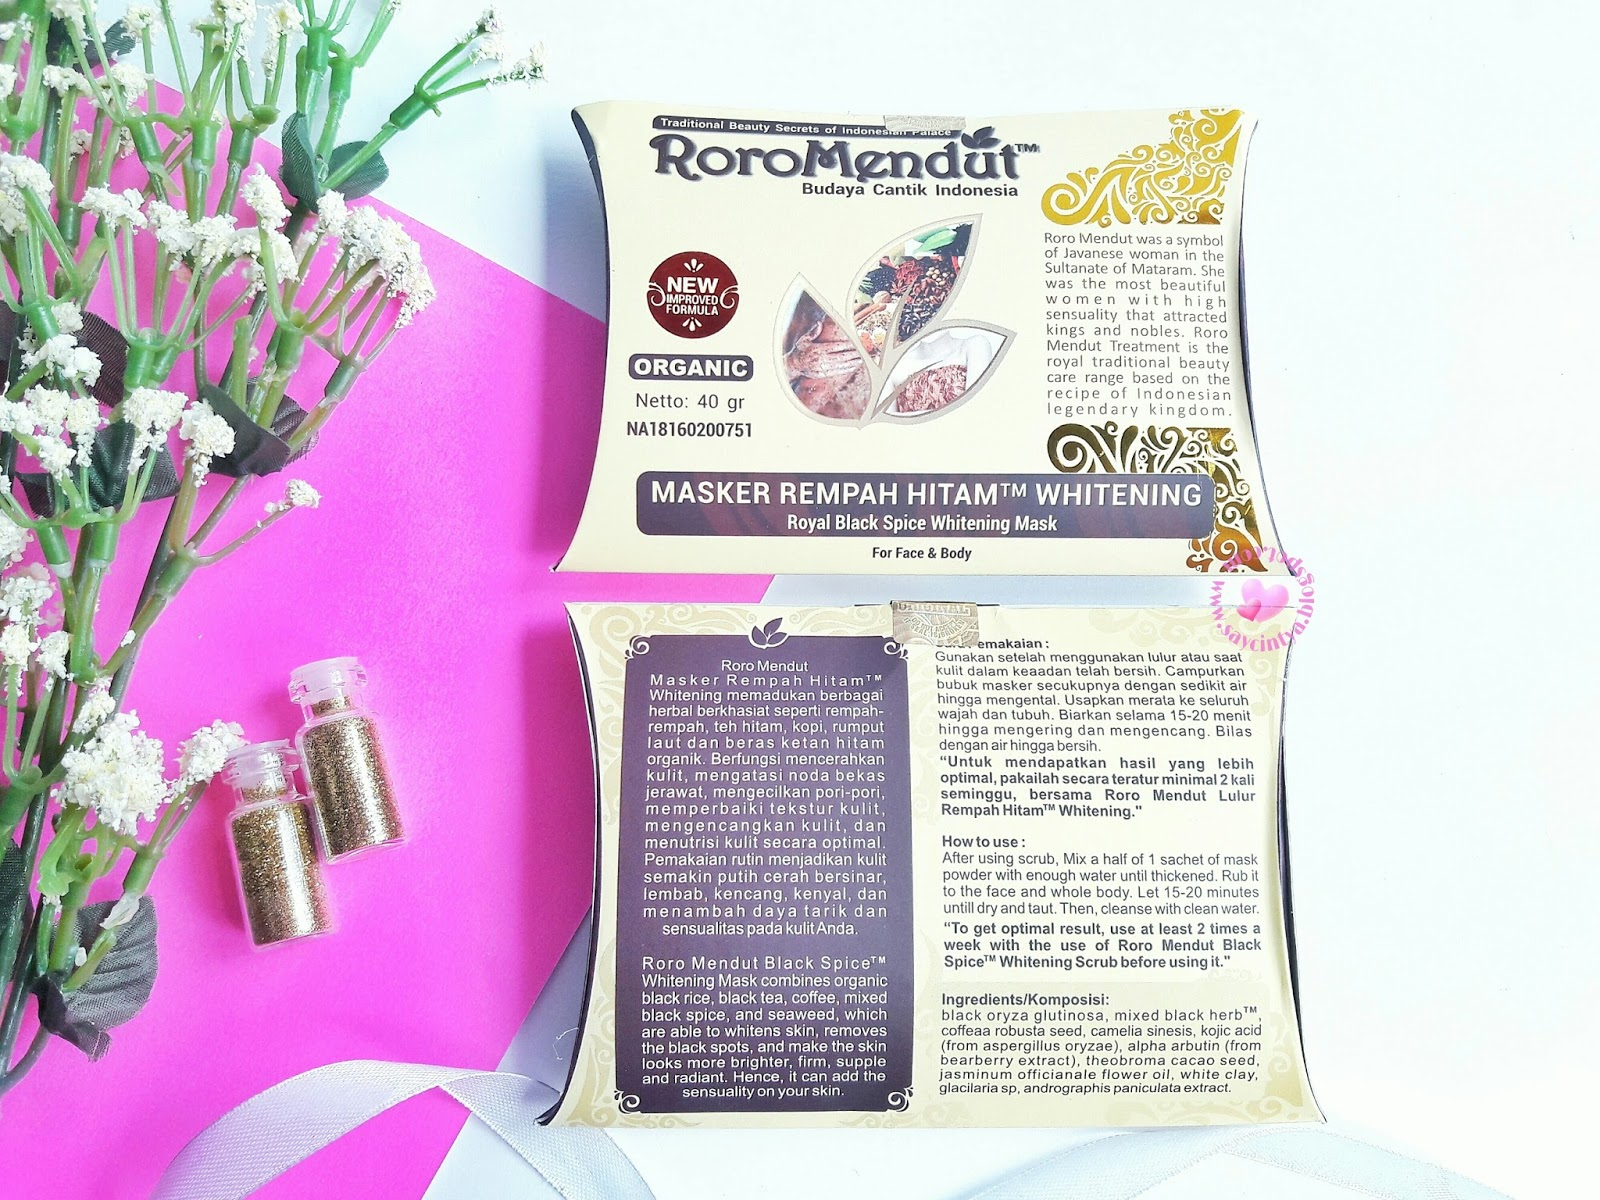 Cintyas Beauty Blog Indonesian Blogger Review Roro Kopi Robusta By Yoen Iskan Akumandiri Nah Setelah Overview Singkat Mengenai Produk Mendut Di Atas Jadi Yakin Ya Kalau Lulur Dan Masker Pemutih Wajah Ini Aman Bukan Abal